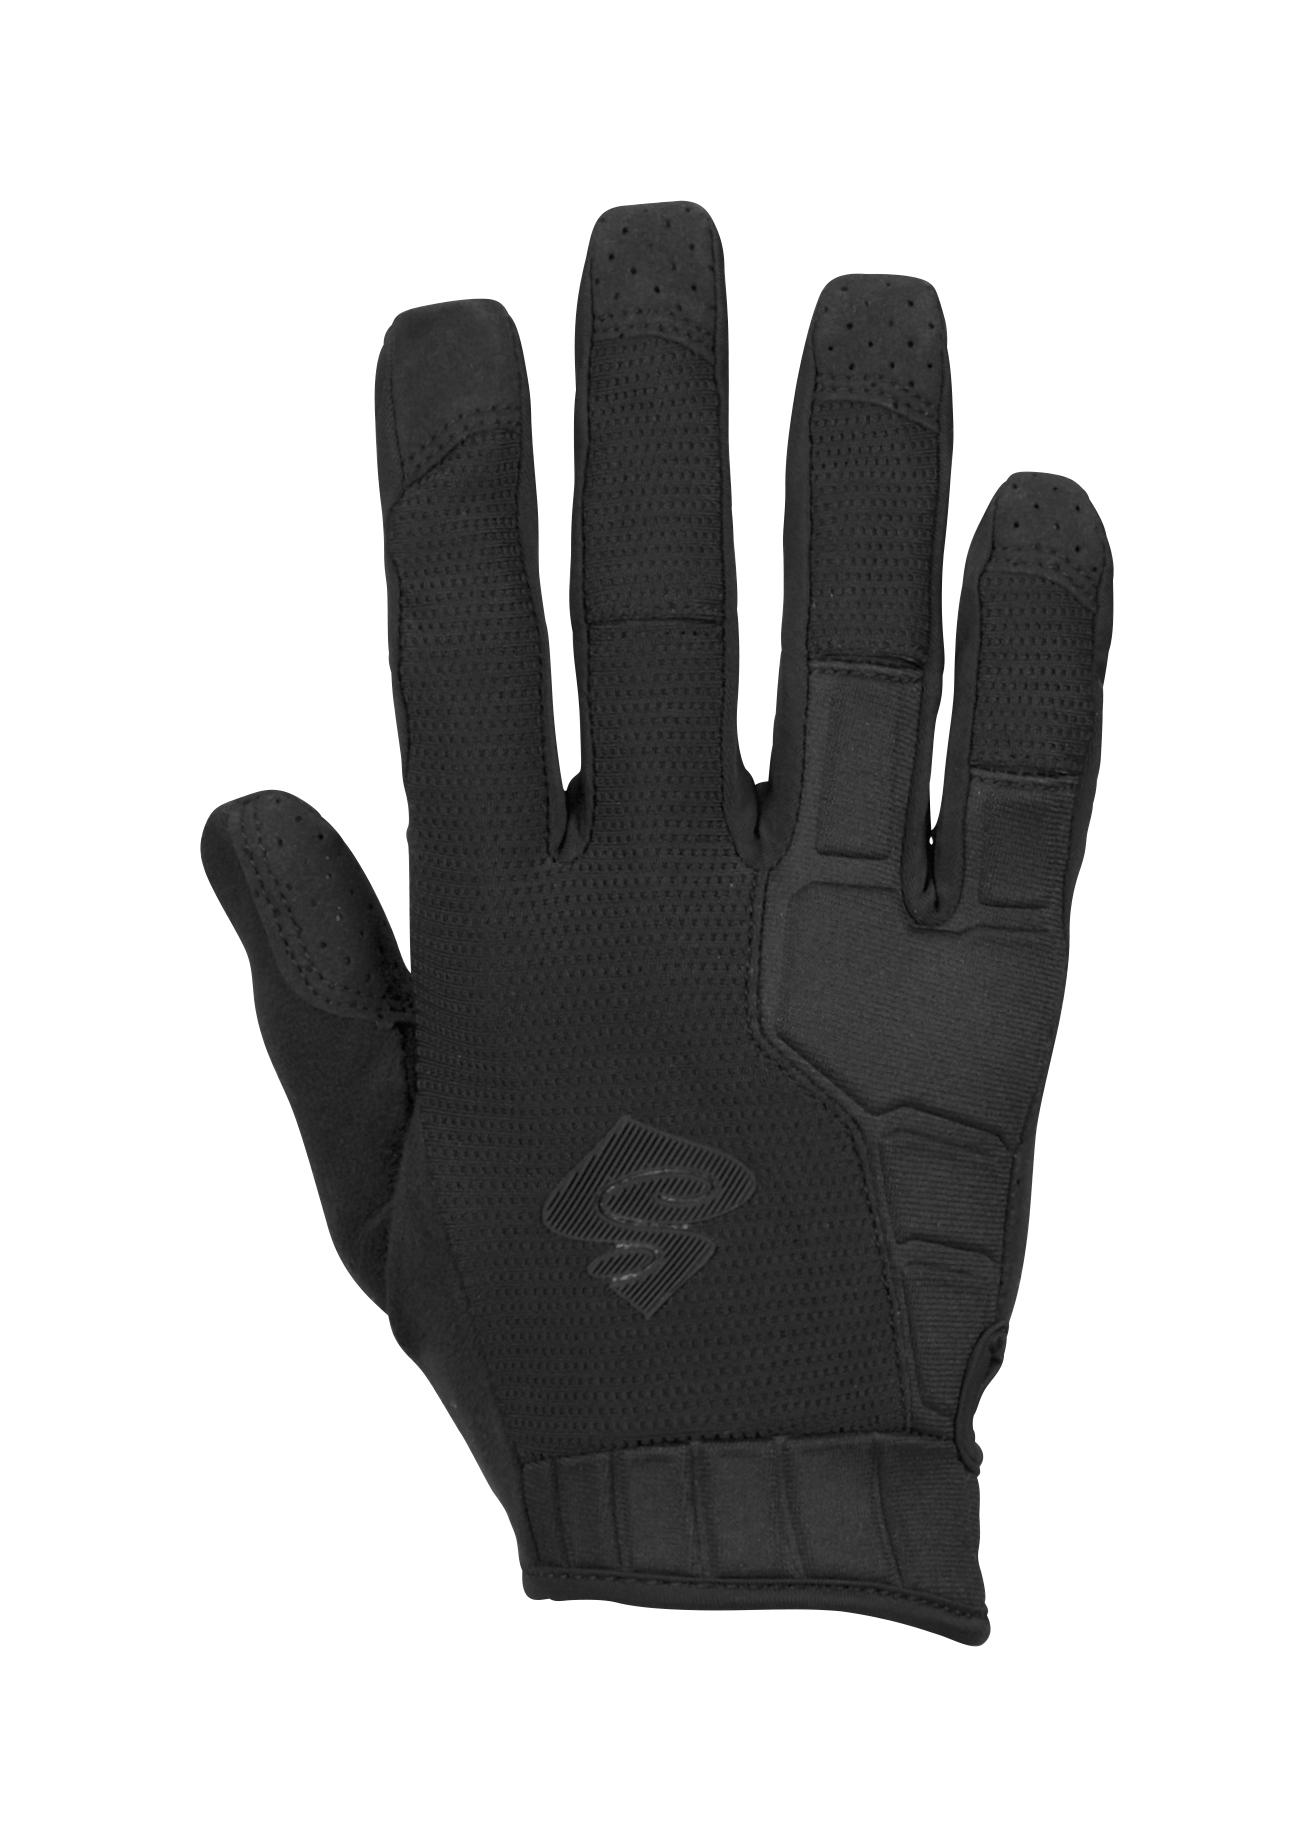 828051-hunter_race_gloves-true_black-front.jpg